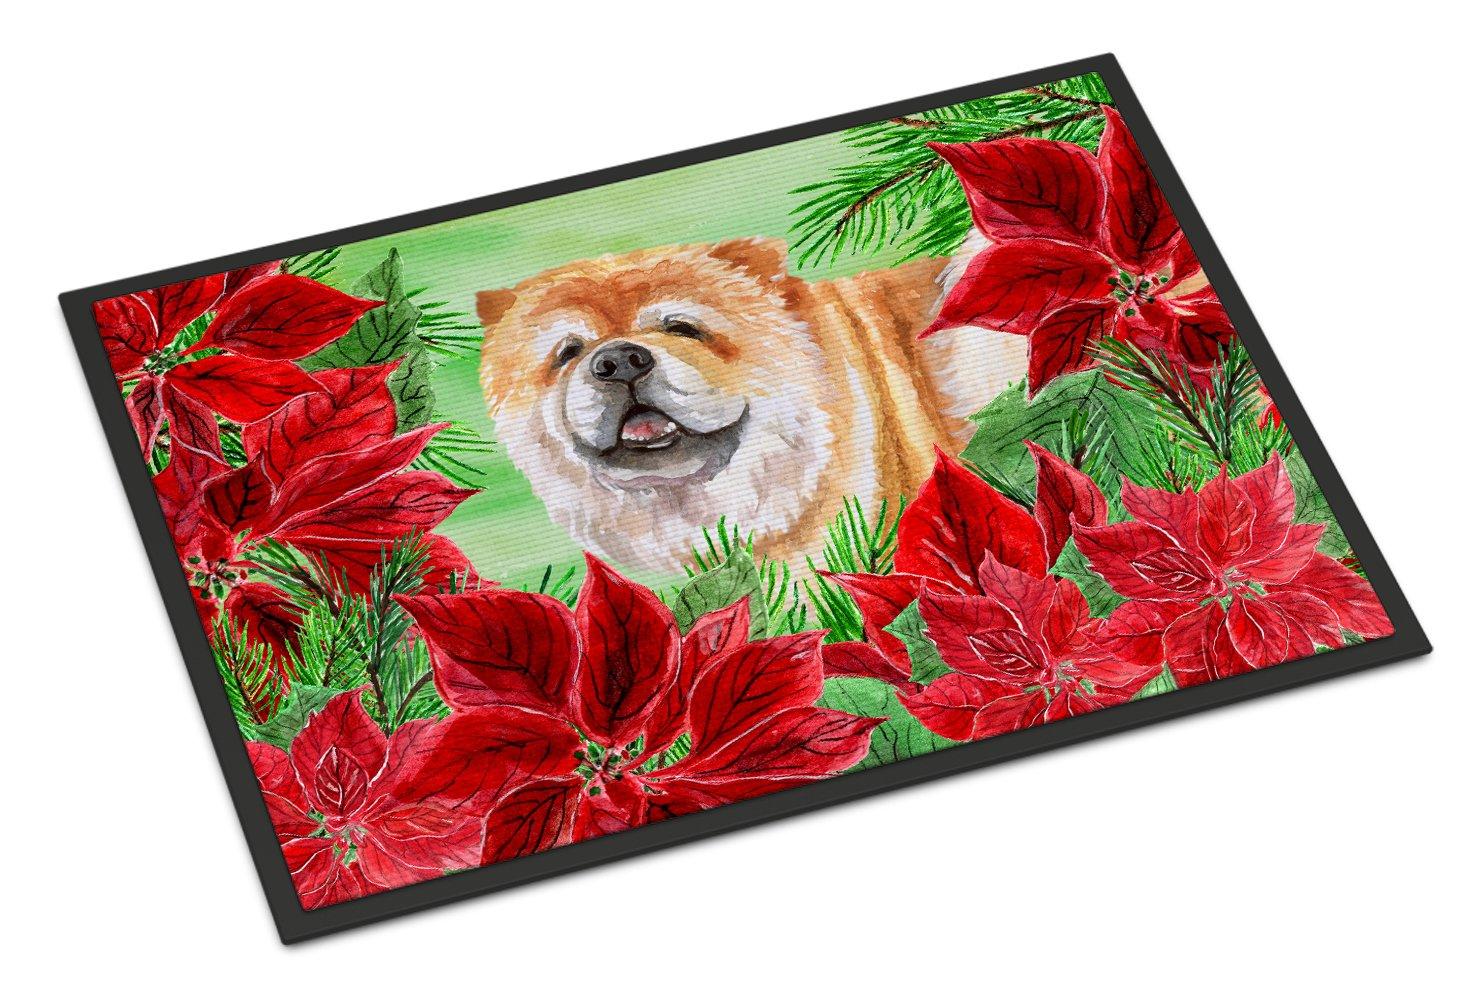 Carolines Treasures Shih Tzu Poinsettias Doormat 24 x 36 Multicolor